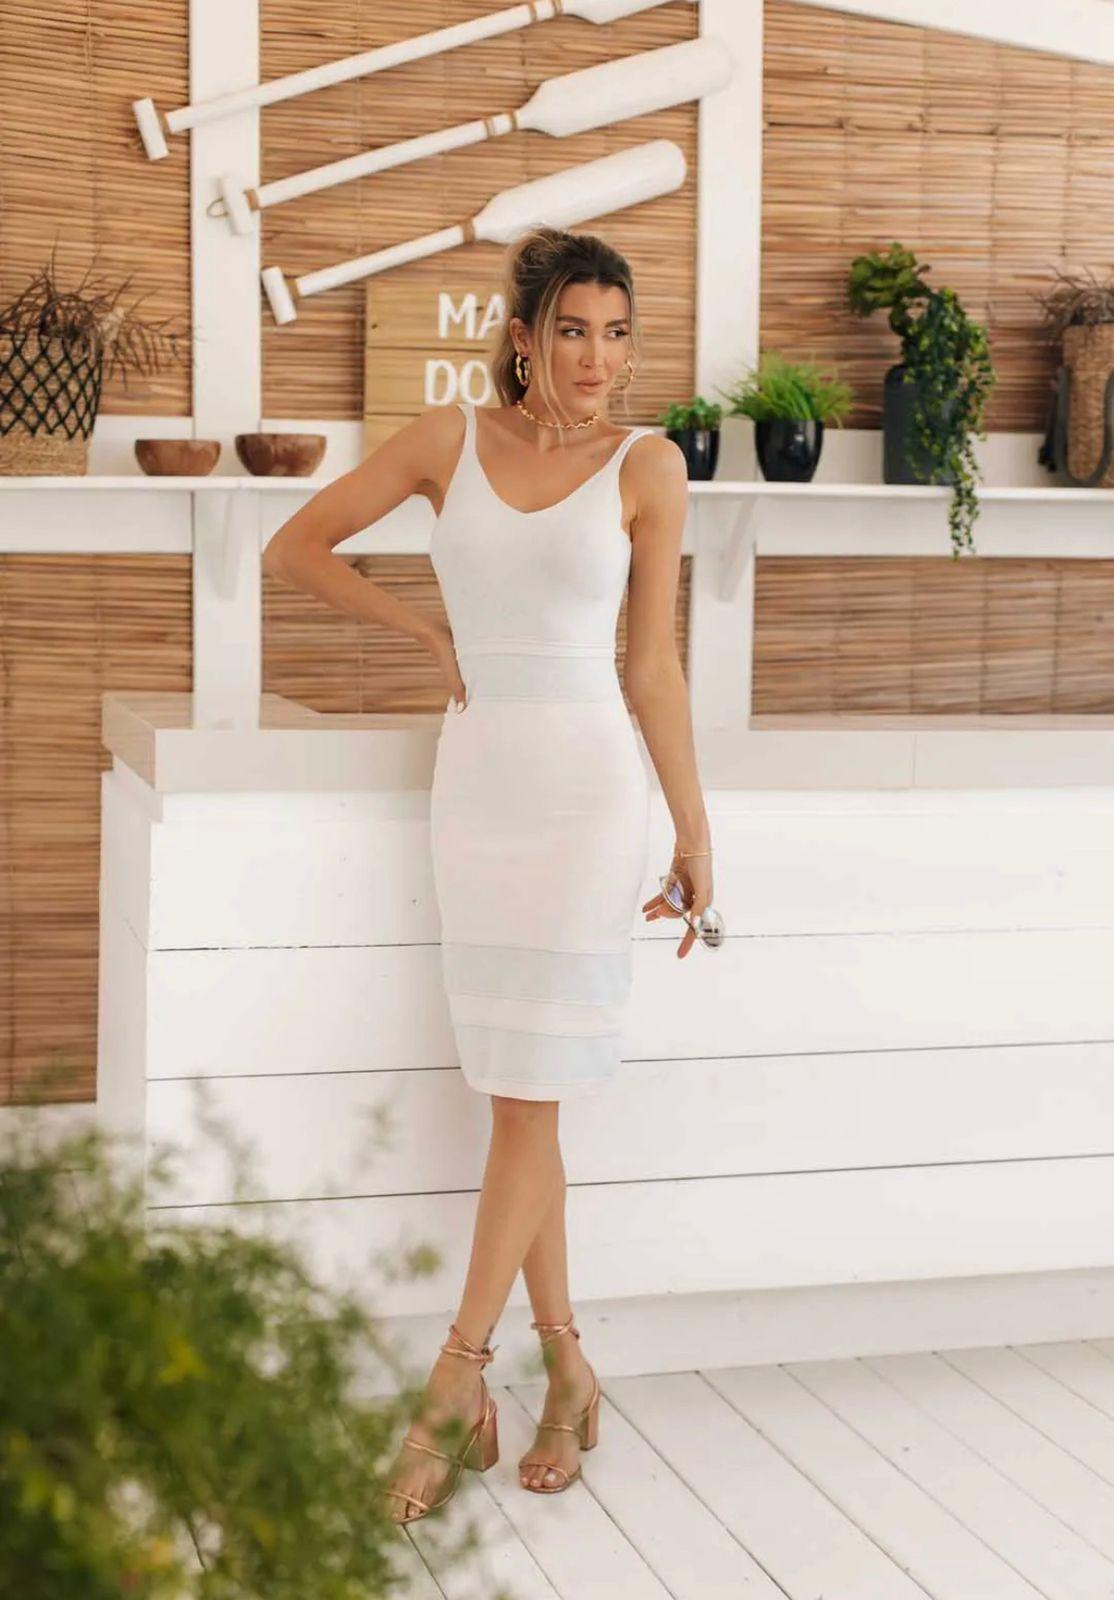 Vestido de Tricot Modal Midi de Alças